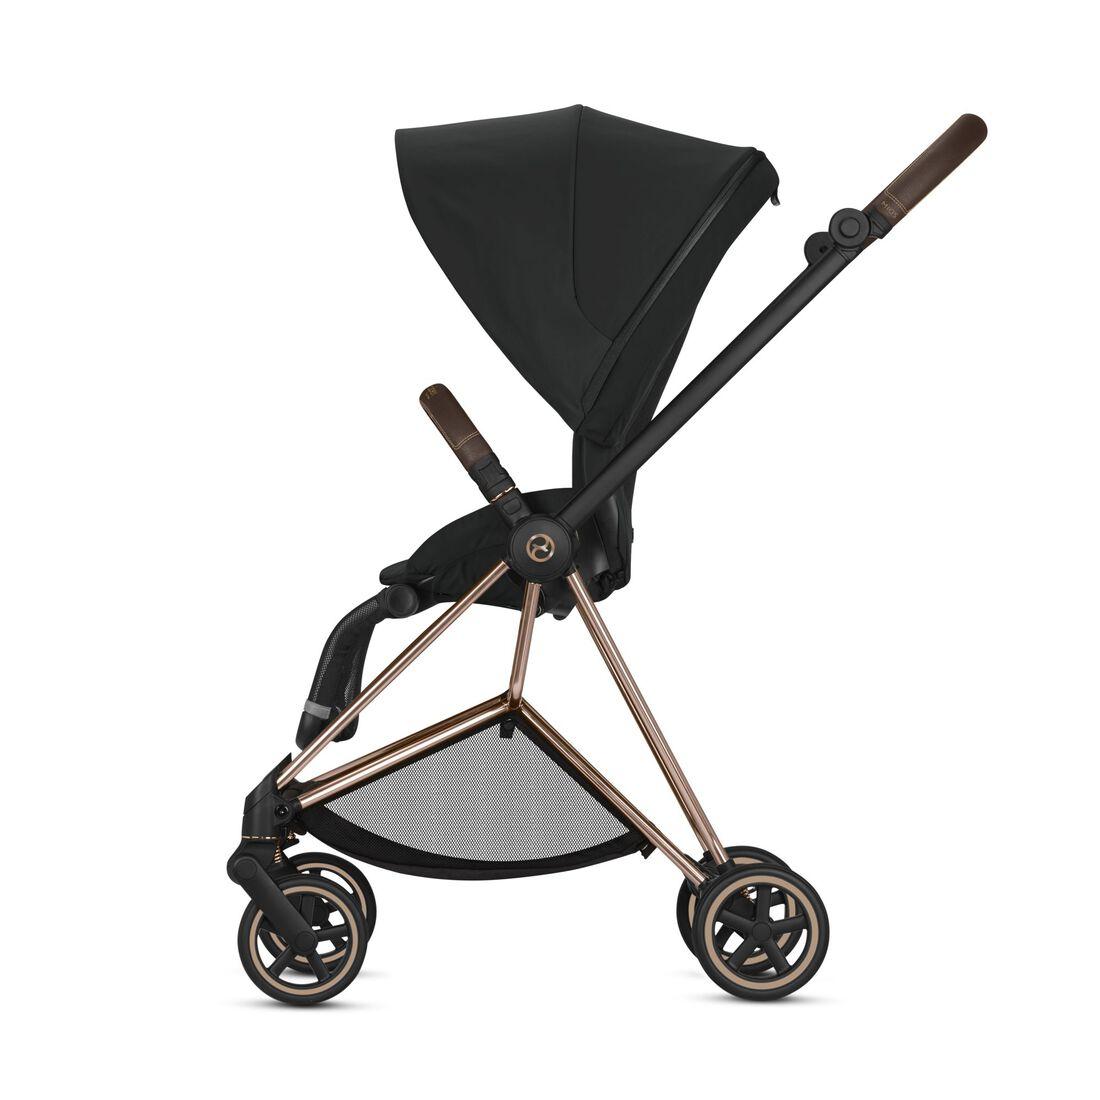 CYBEX MIOS Stroller - Small Wonder